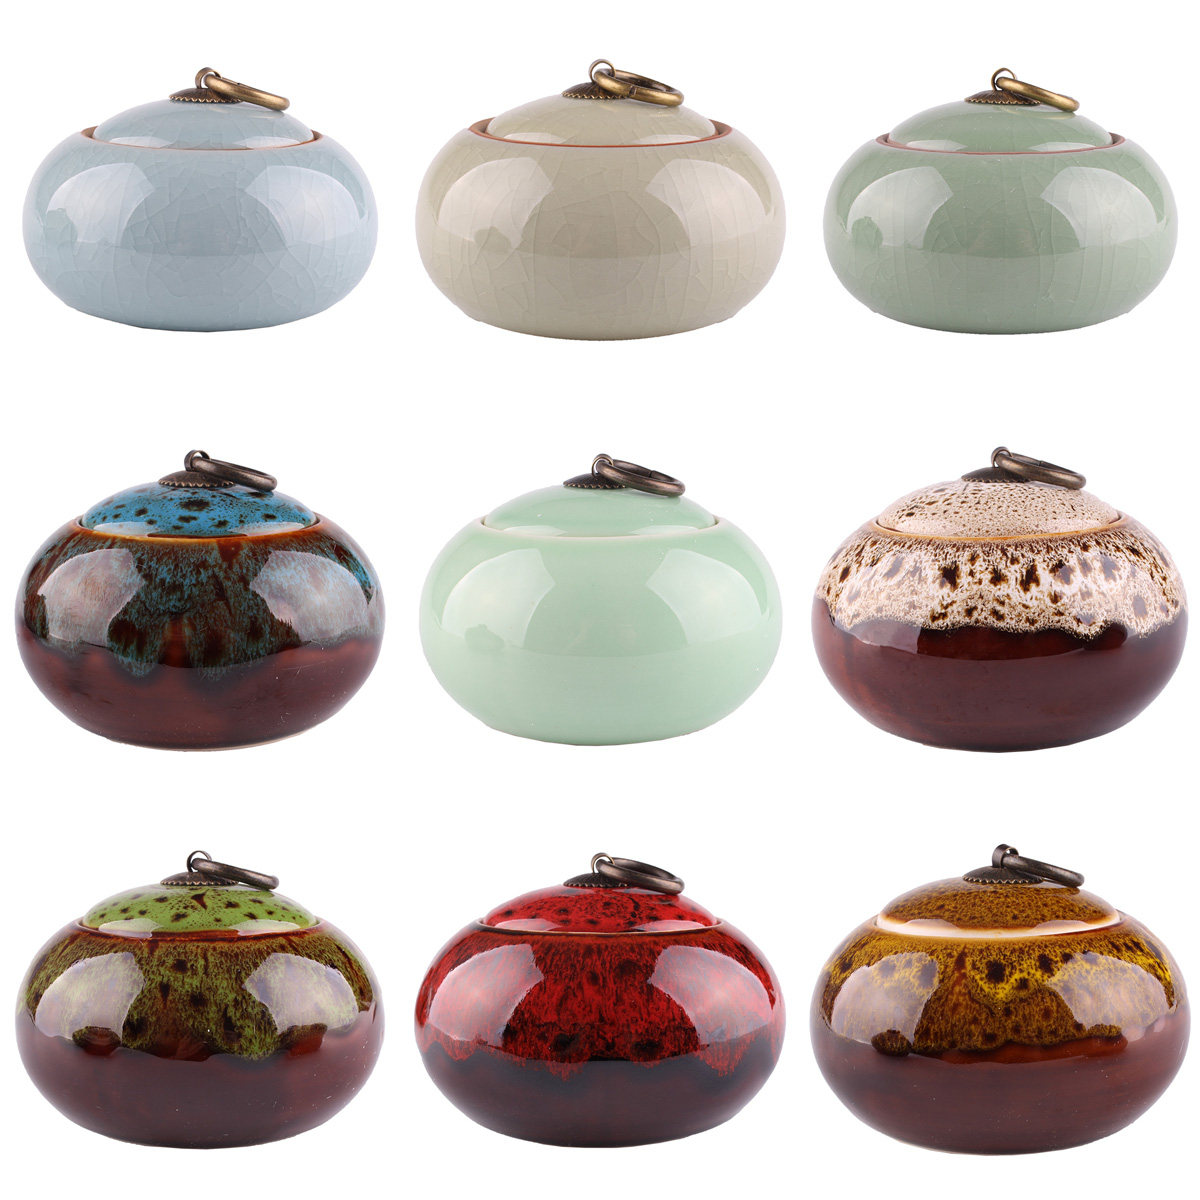 9 styles china Ceramic Tea Spice Nuts Food Sealed Storage Bottles Jars Container Caddy Sugar Salt Storage Tank Canister U-pick